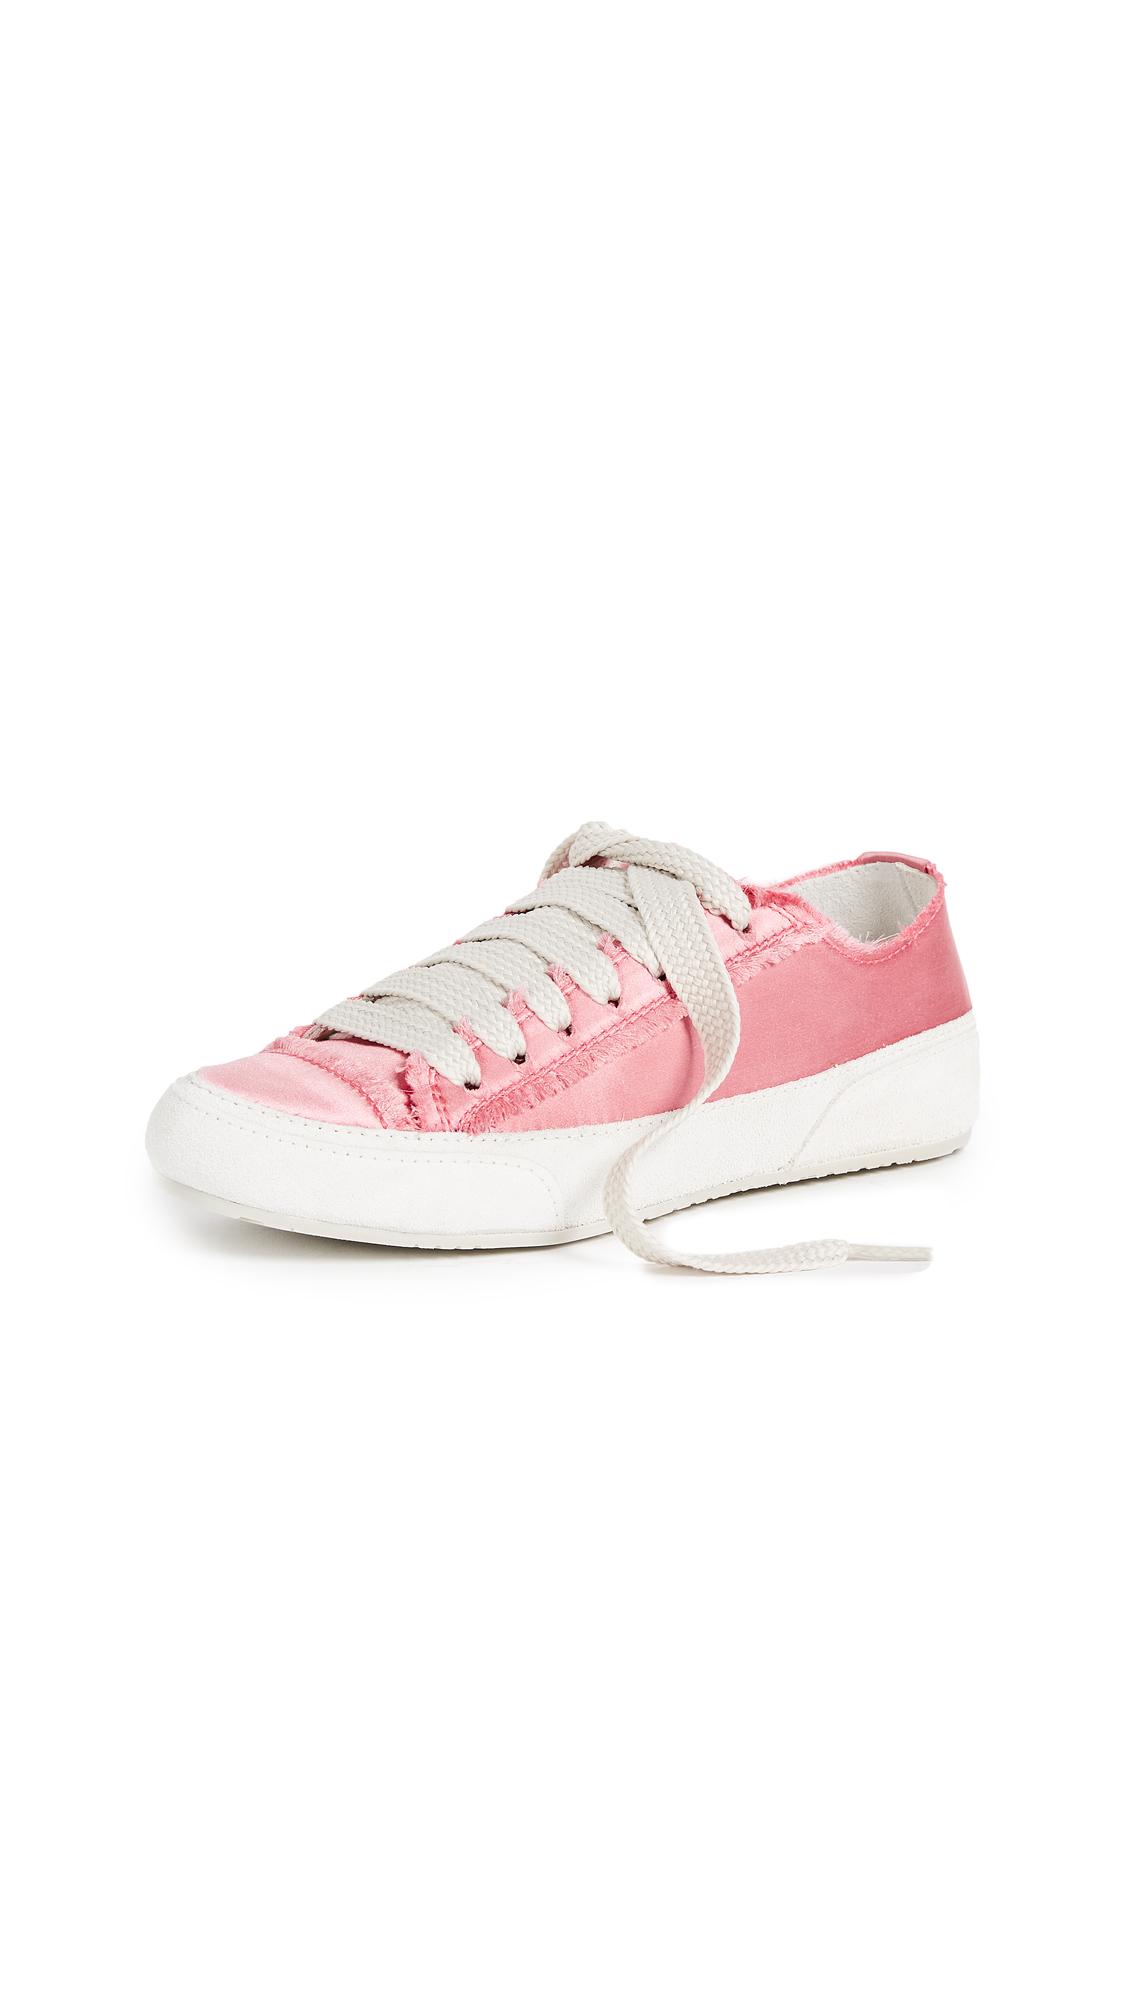 Pedro Garcia Parson Sneakers - Rose